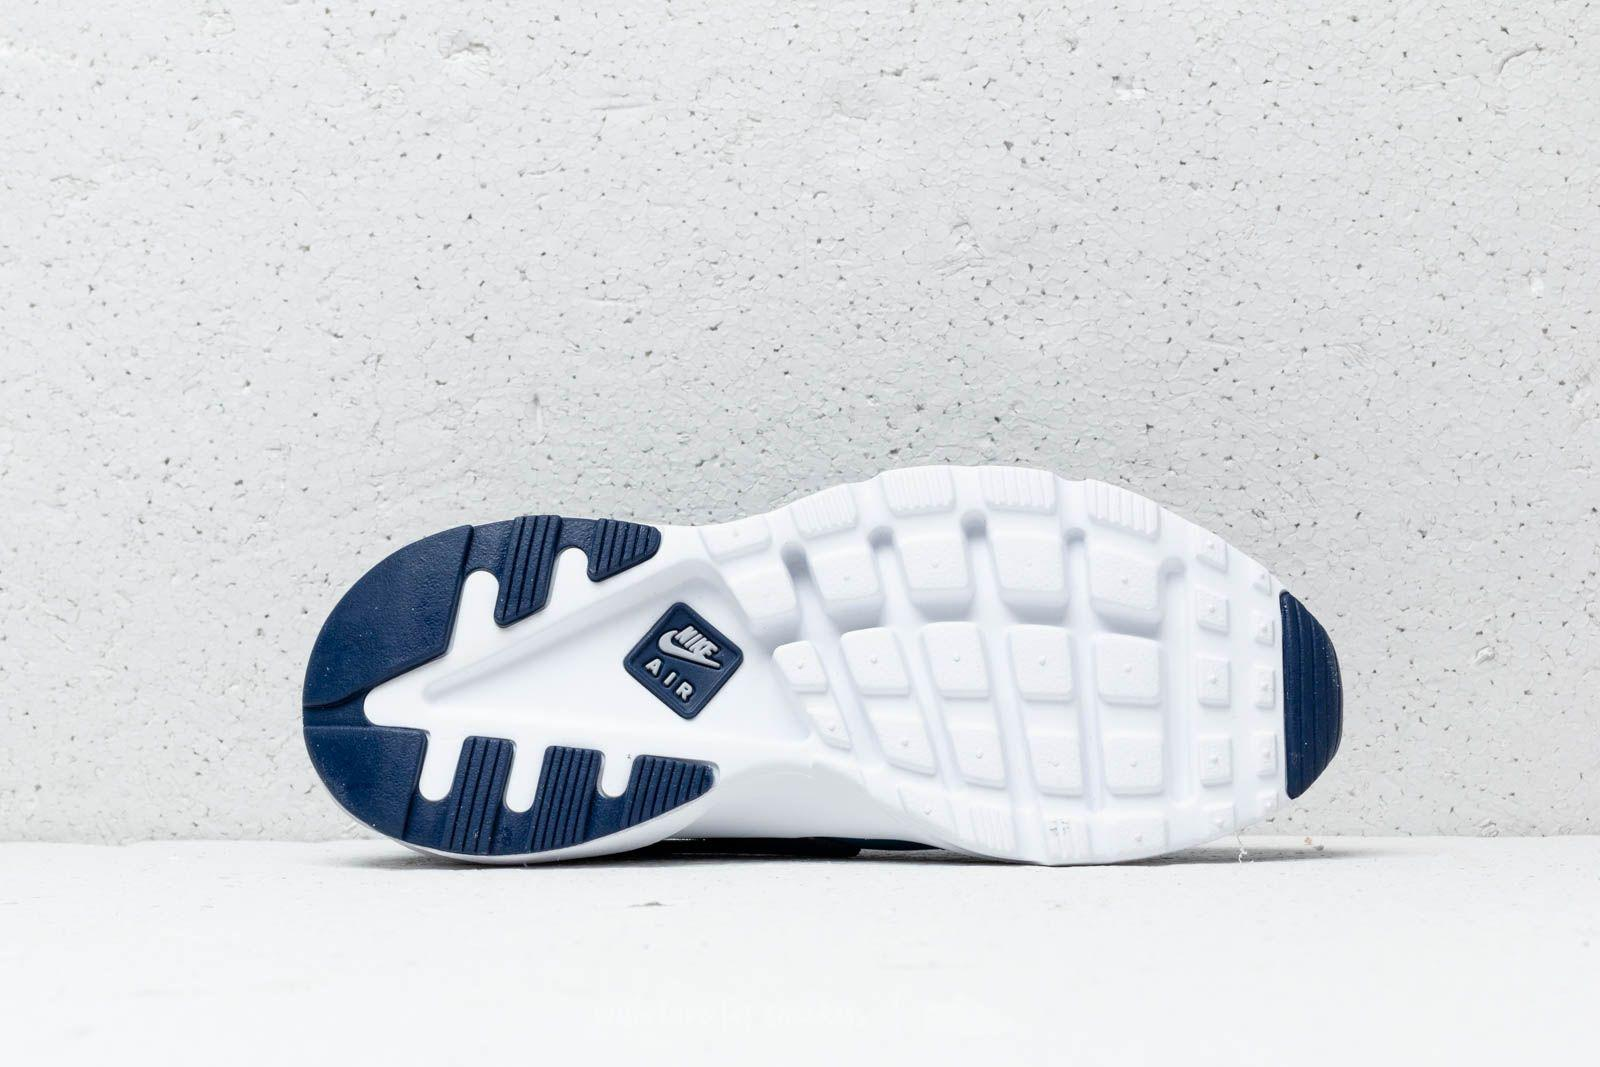 66a7f0efca9d6 Lyst - Nike Air Huarache Run Ultra Gs Blue Force  Wolf Grey-blue ...